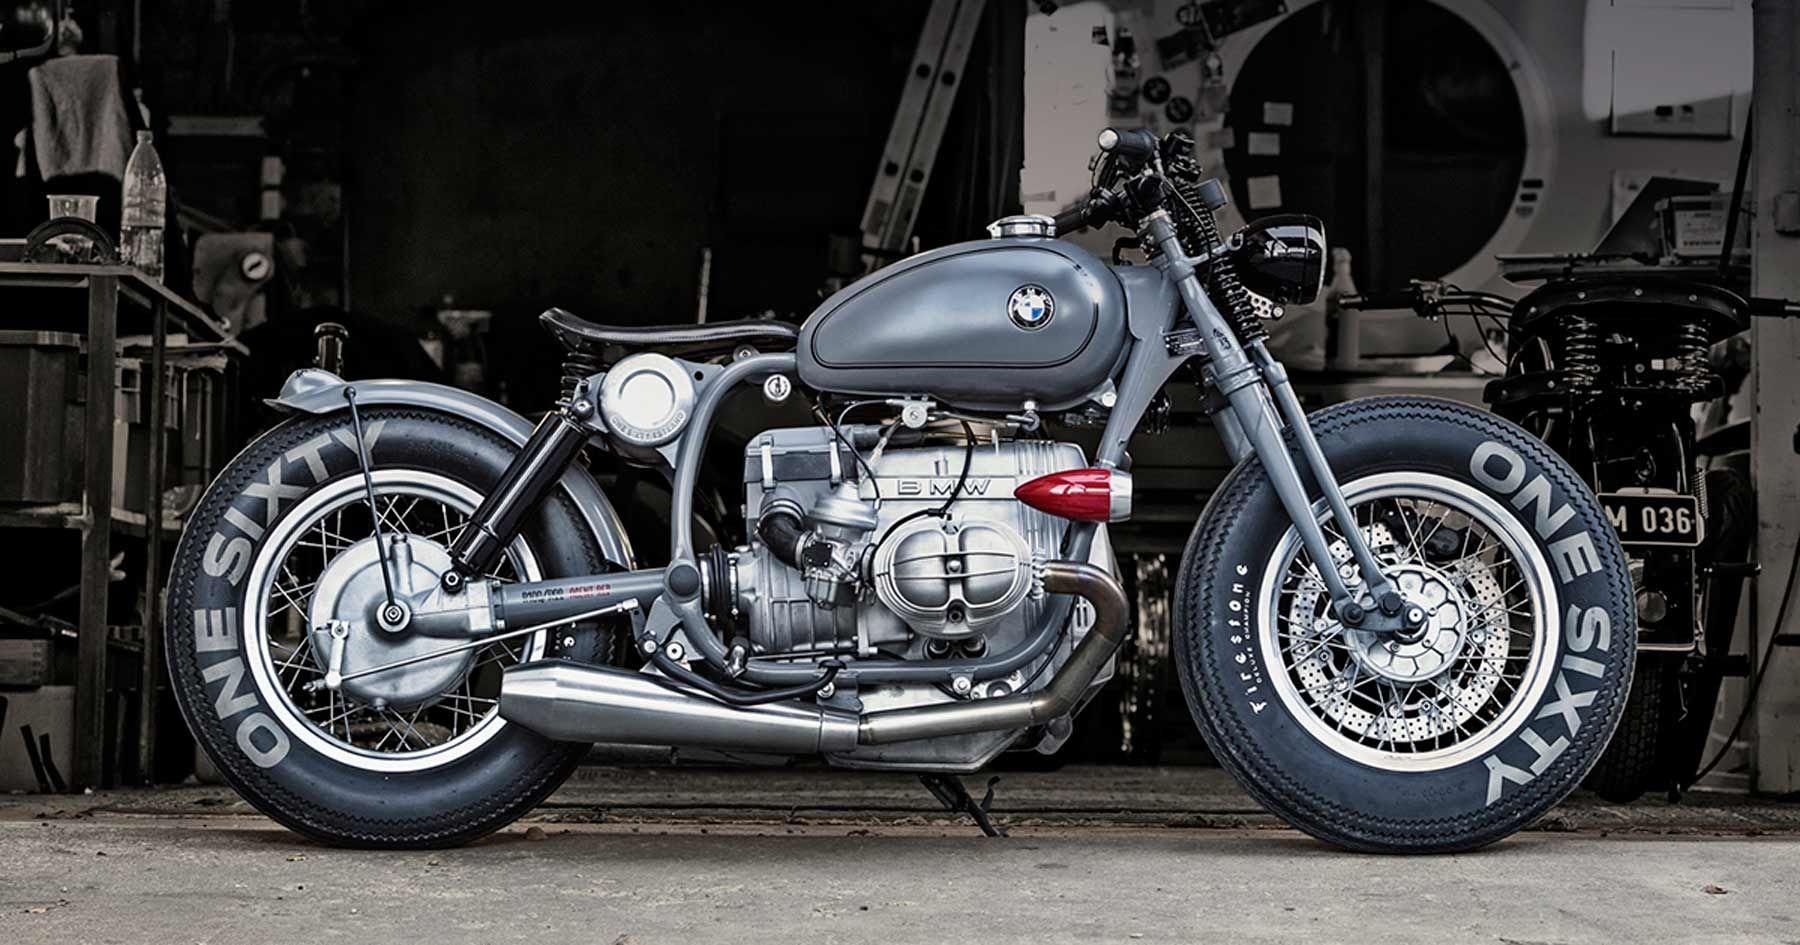 Fahrenheit 160 Renard S Smokin Bmw Bobber Bobber Motorcycle